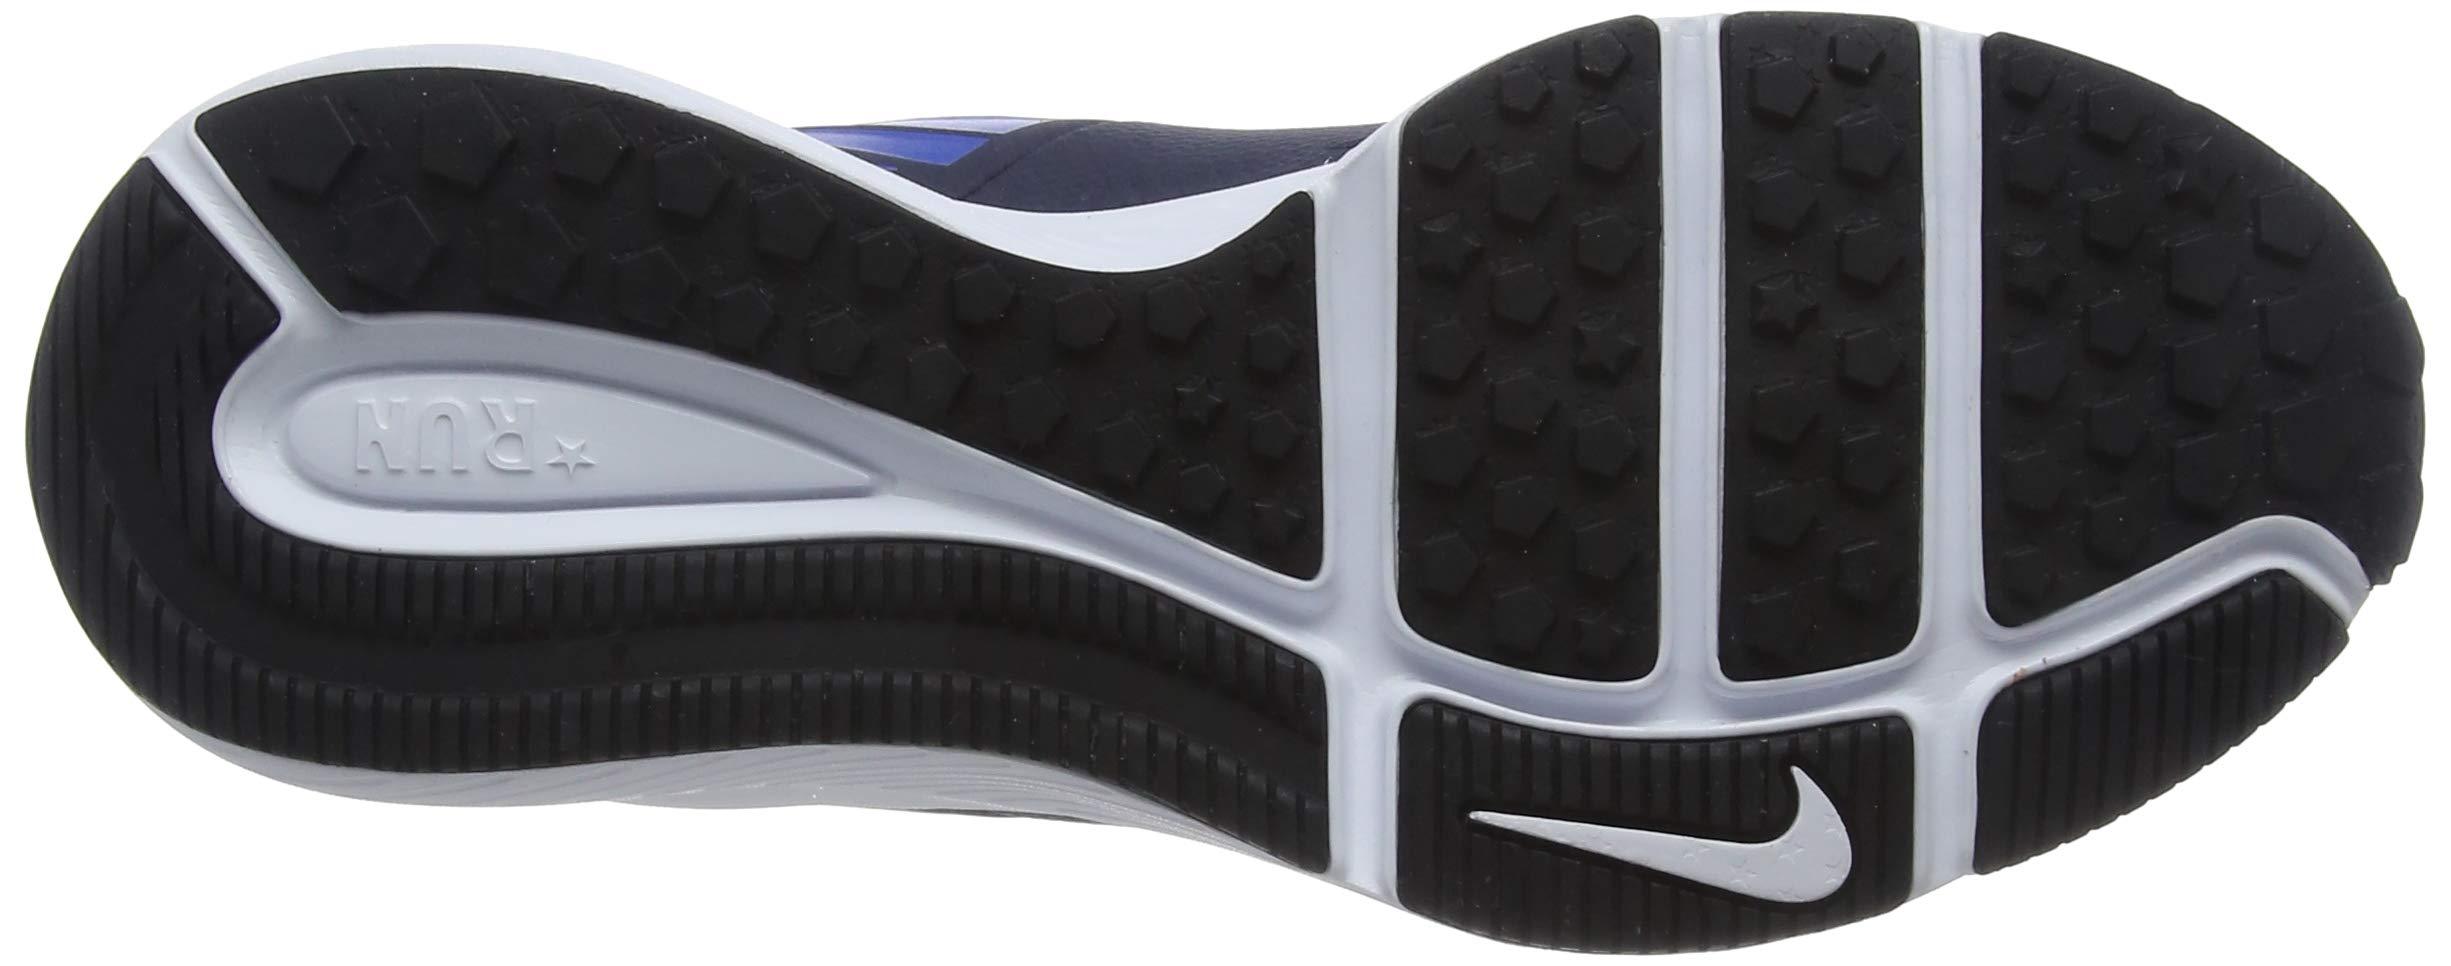 Nike Boy's Star Runner (GS) Running Shoe Obsidian/Metallic Silver/Signal Blue Size 3.5 M US by Nike (Image #3)